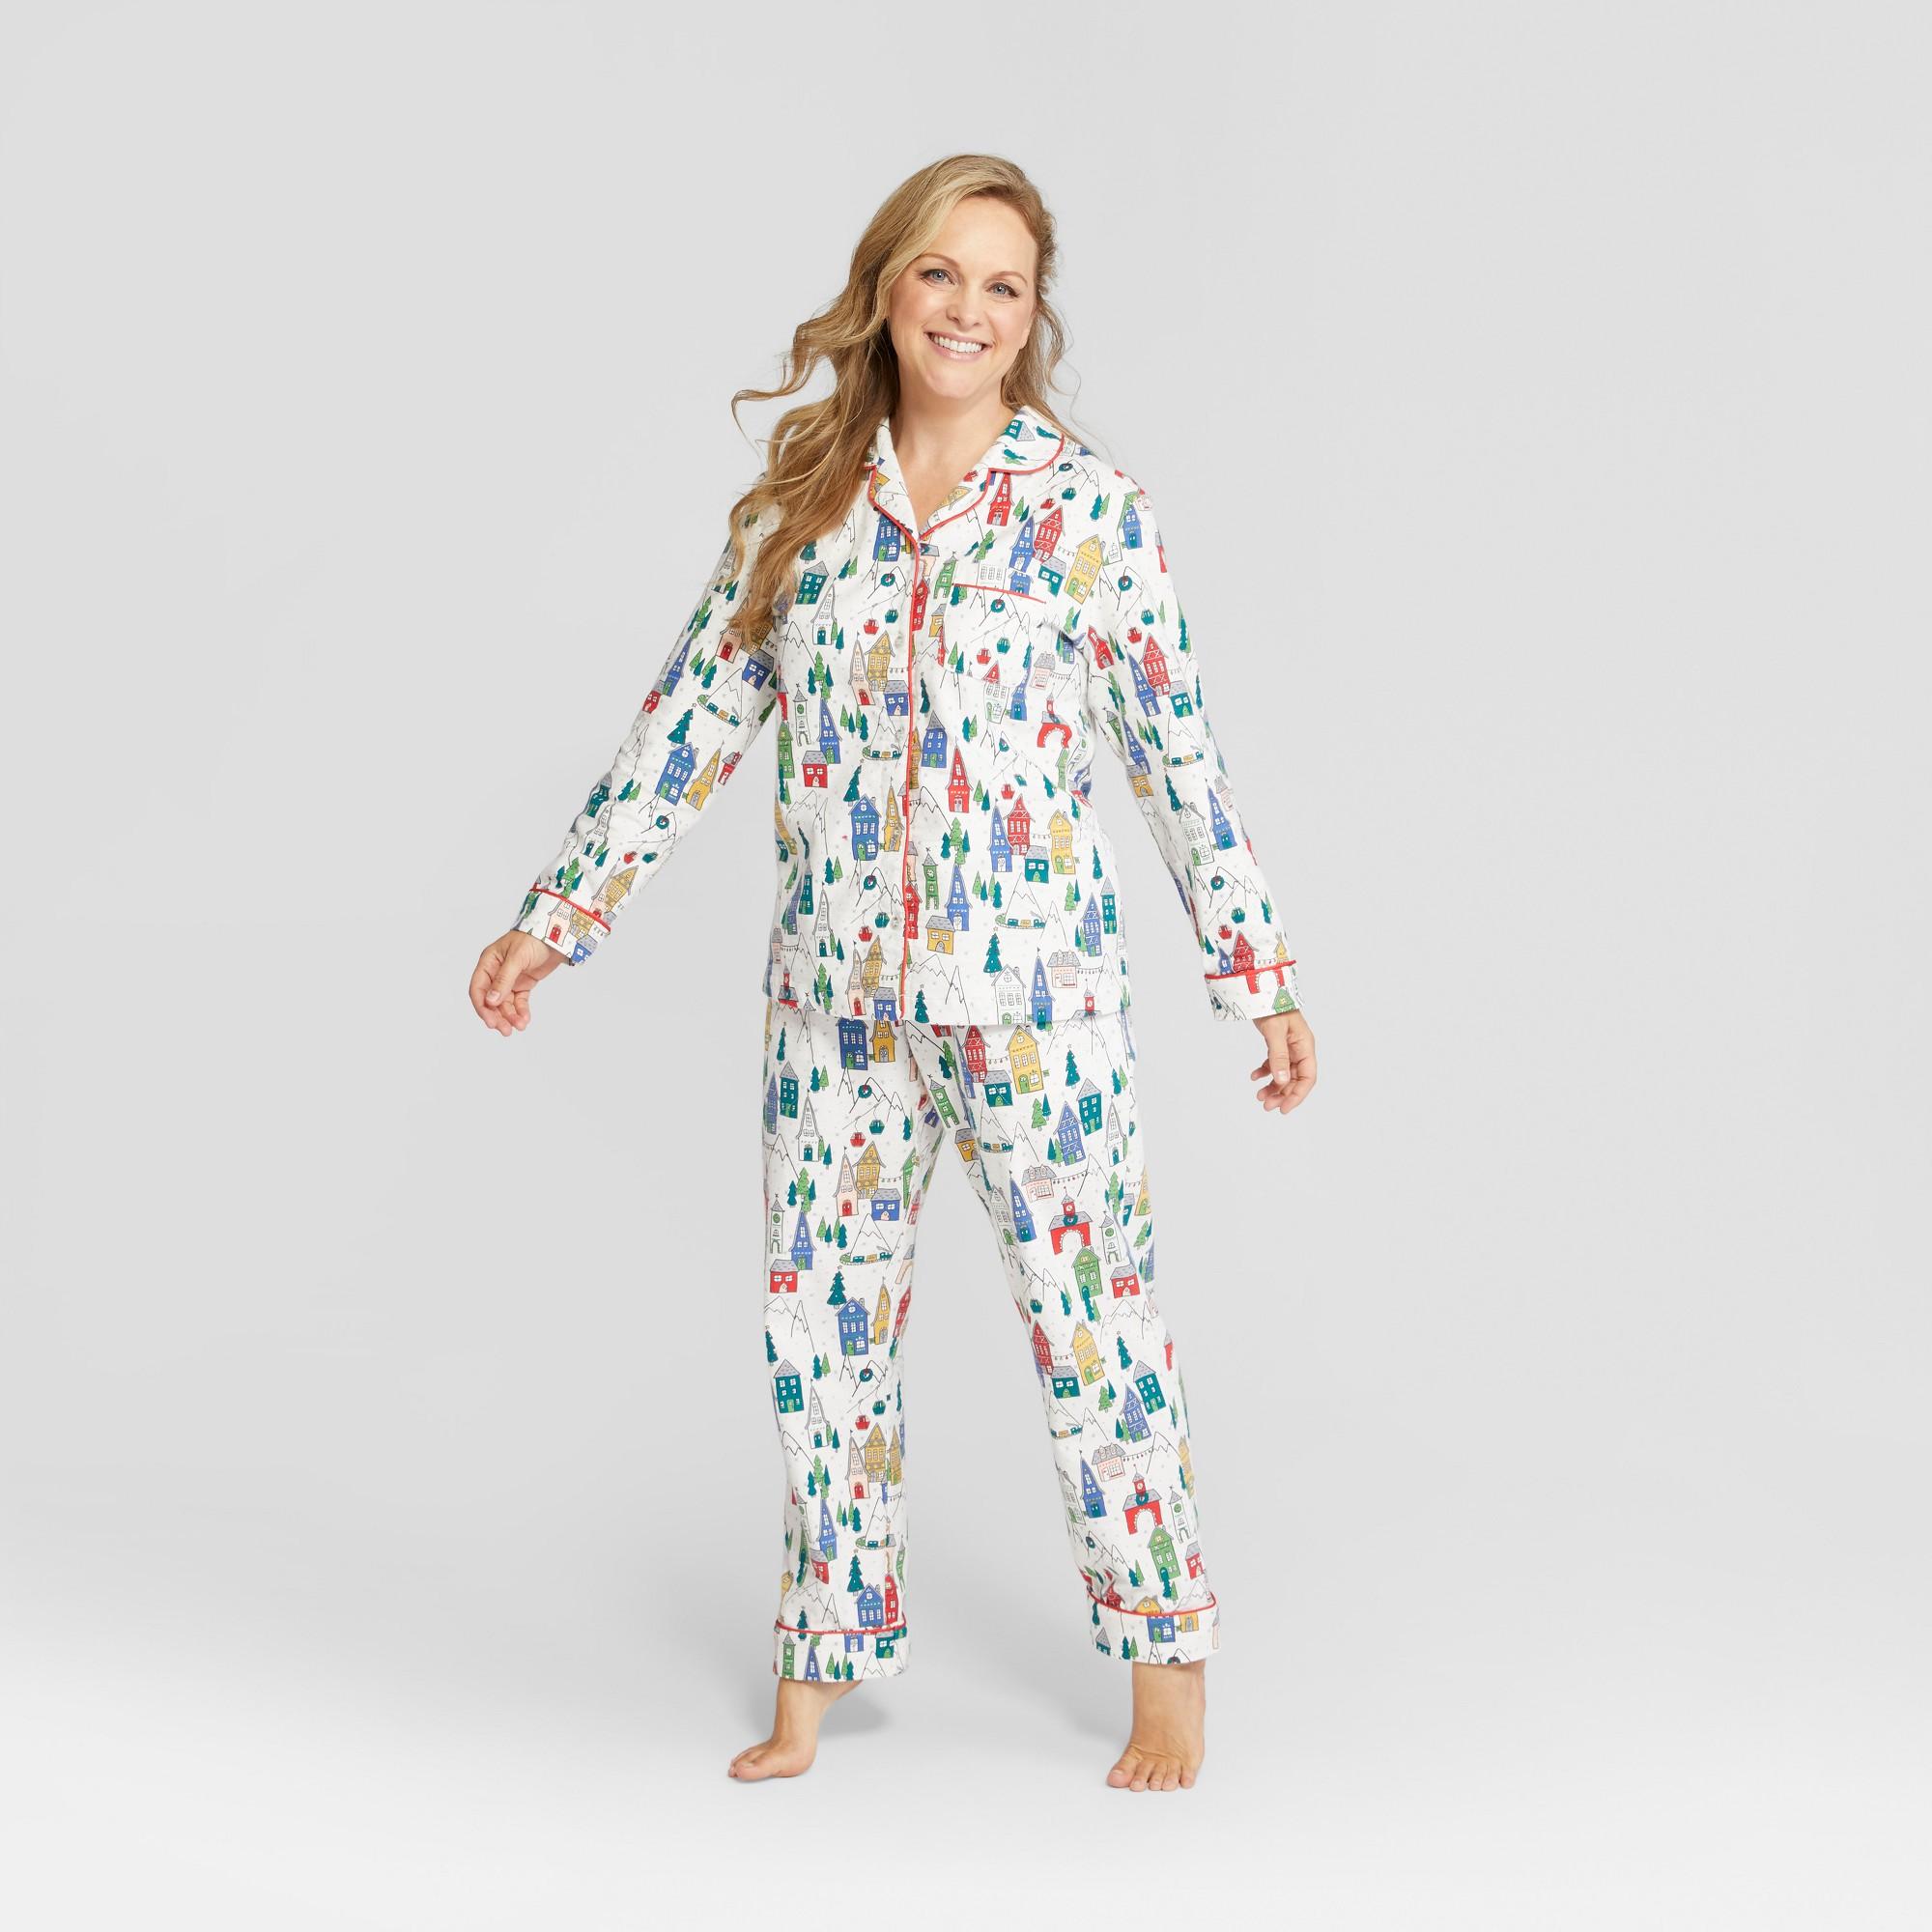 ccd2f7ba712 Women's Holiday Winter Wonderland Notch Collar Mommy and Me Pajama Set -  Wondershop White Xxl